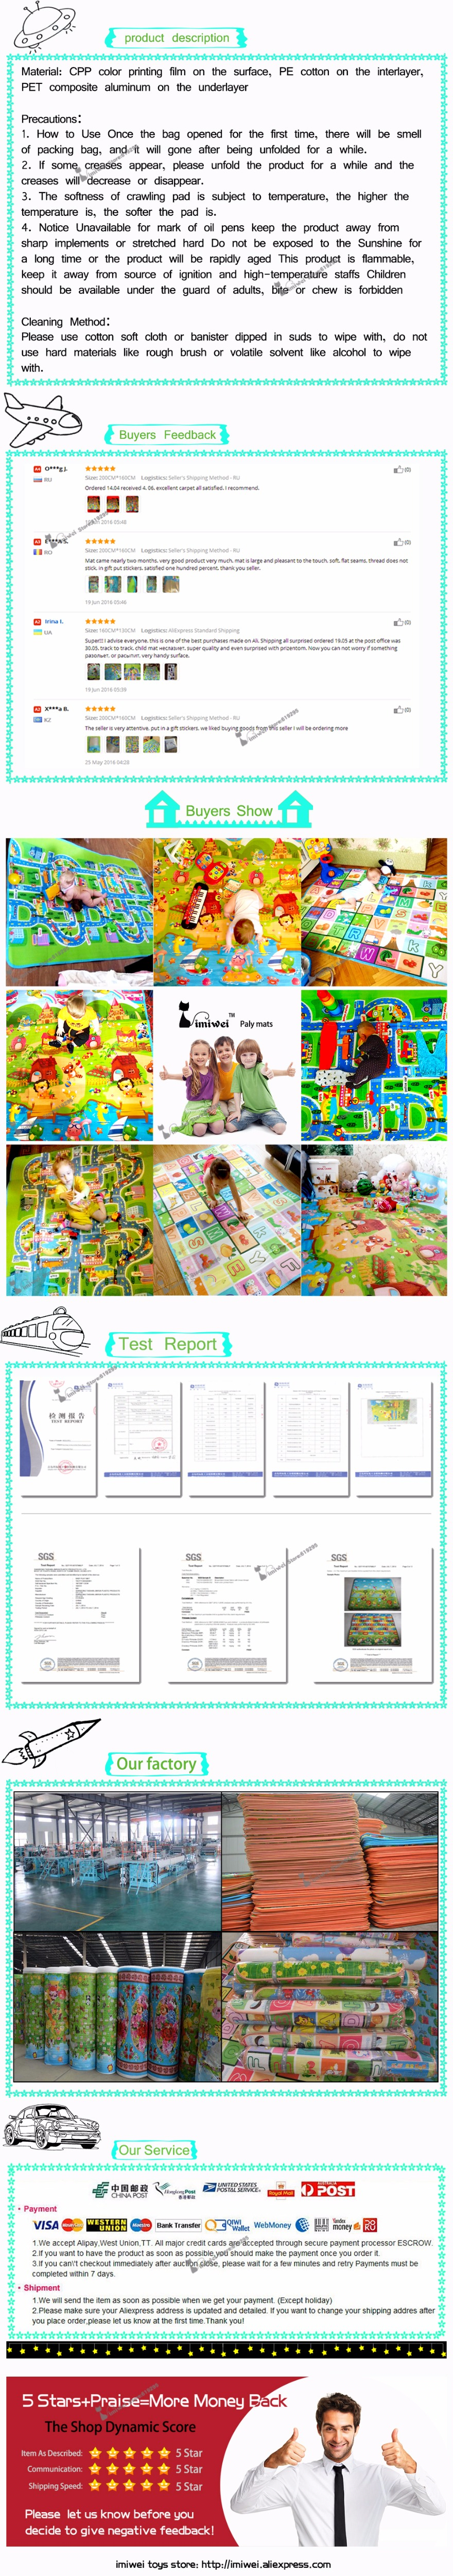 HTB18M2bqyFTMKJjSZFAq6AkJpXa6 Playmat Baby Play Mat Toys For Children's Mat Rug Kids Developing Mat Rubber Eva Foam Play 4 Puzzles Foam Carpets DropShipping